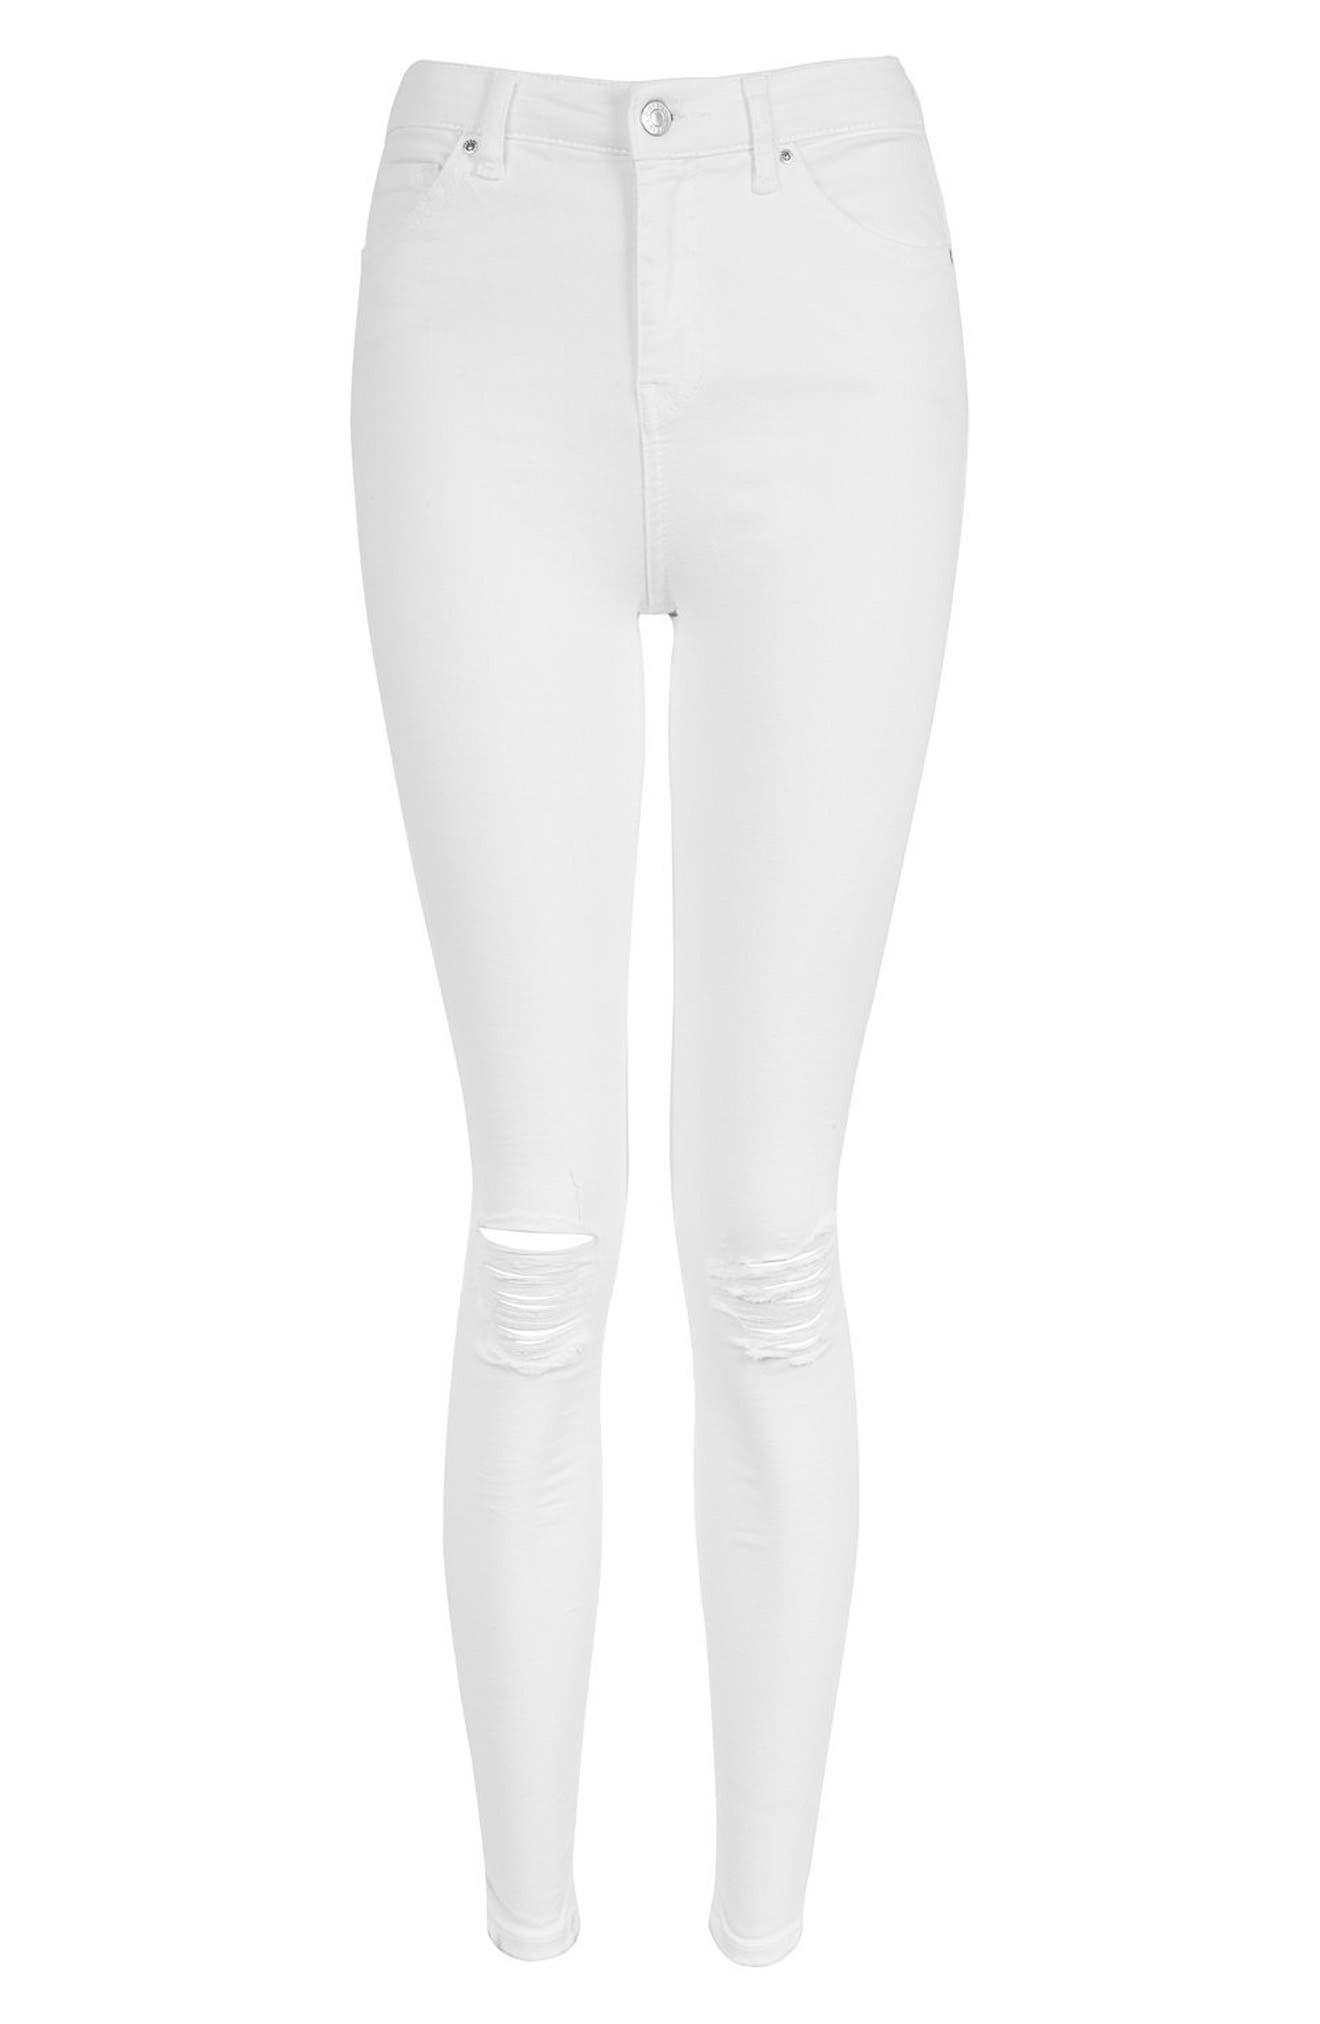 Jamie Ripped Skinny Jeans,                             Alternate thumbnail 5, color,                             White